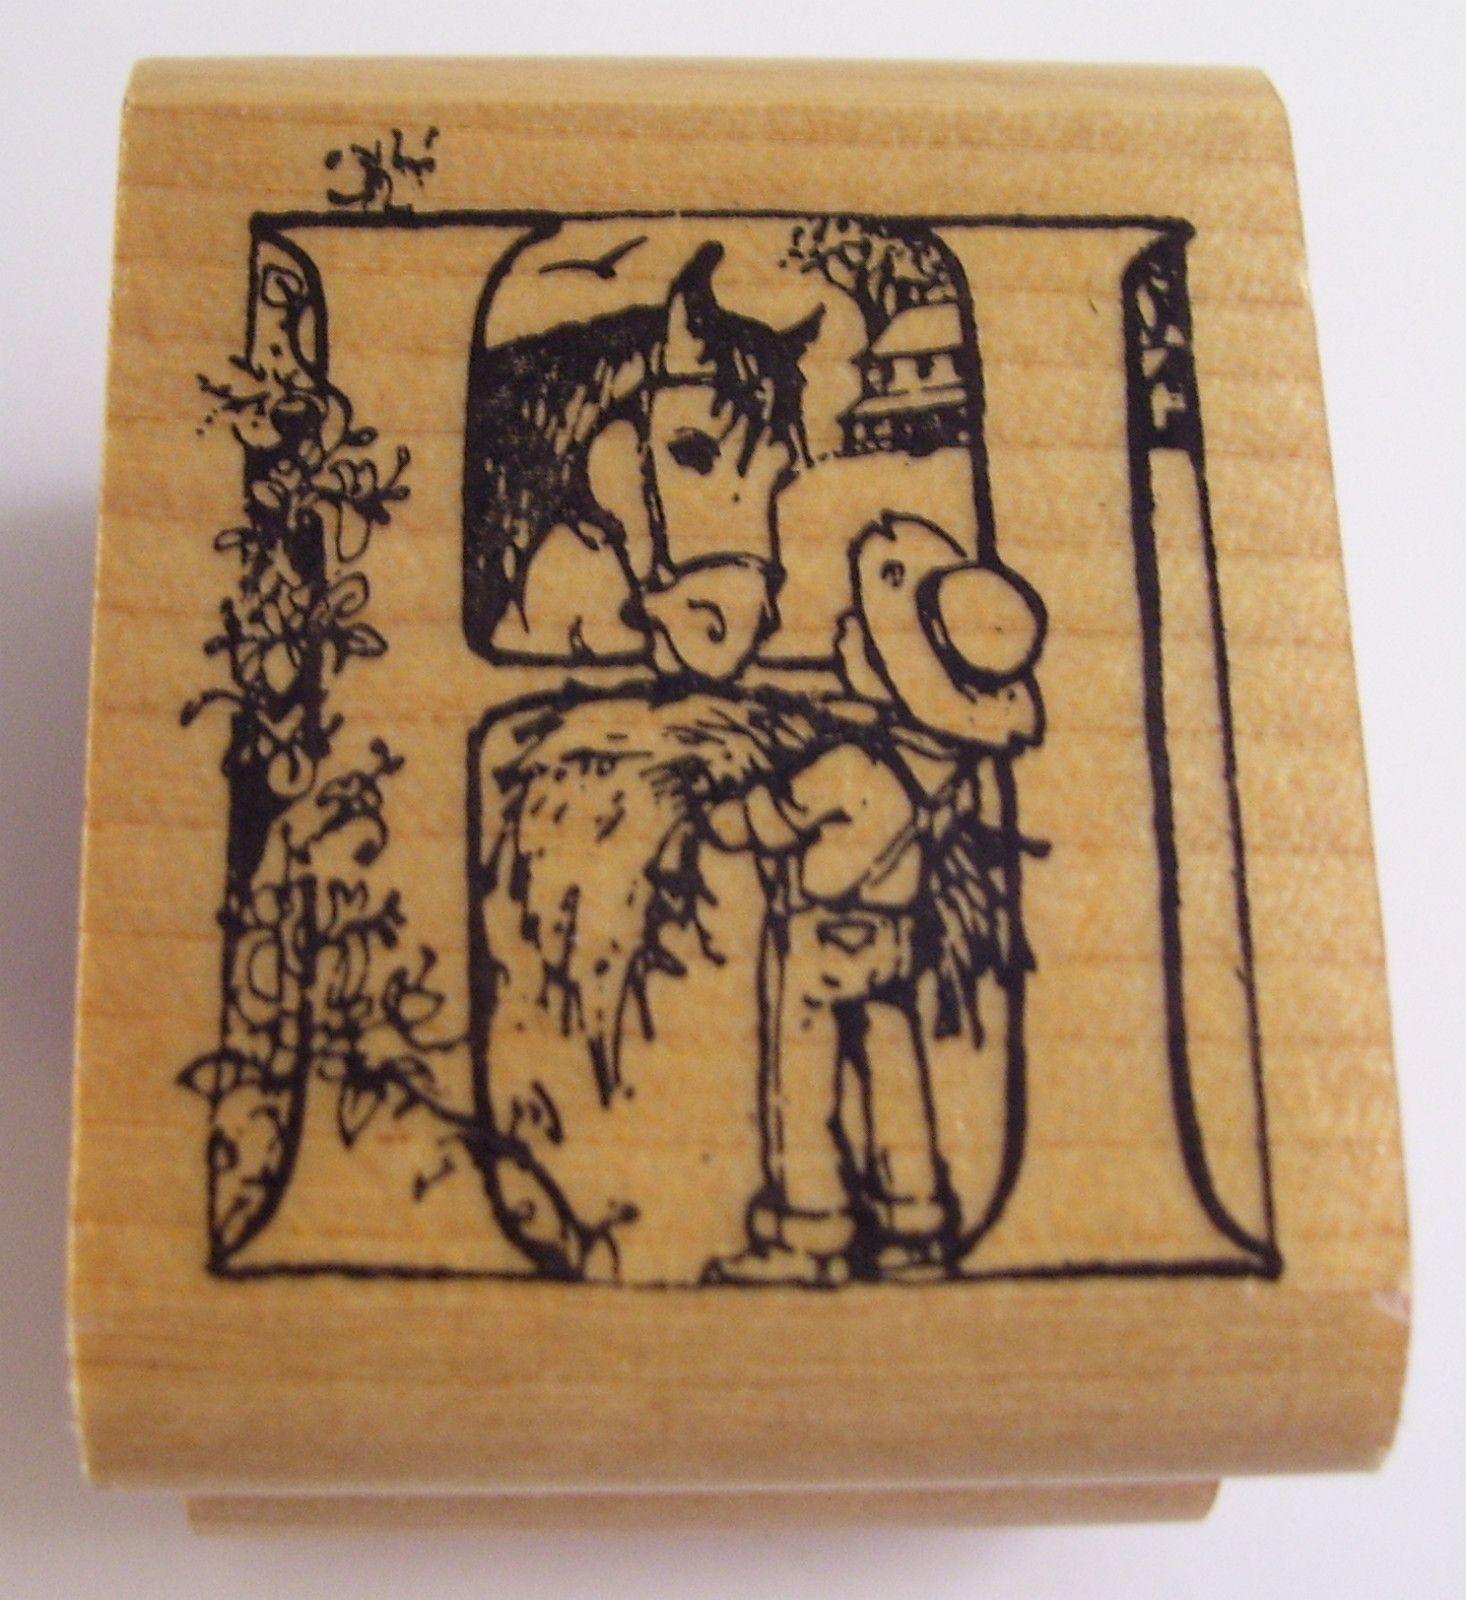 Trina Schart Hyman Alphabet Letter H Kidstamps Rubber Stamp